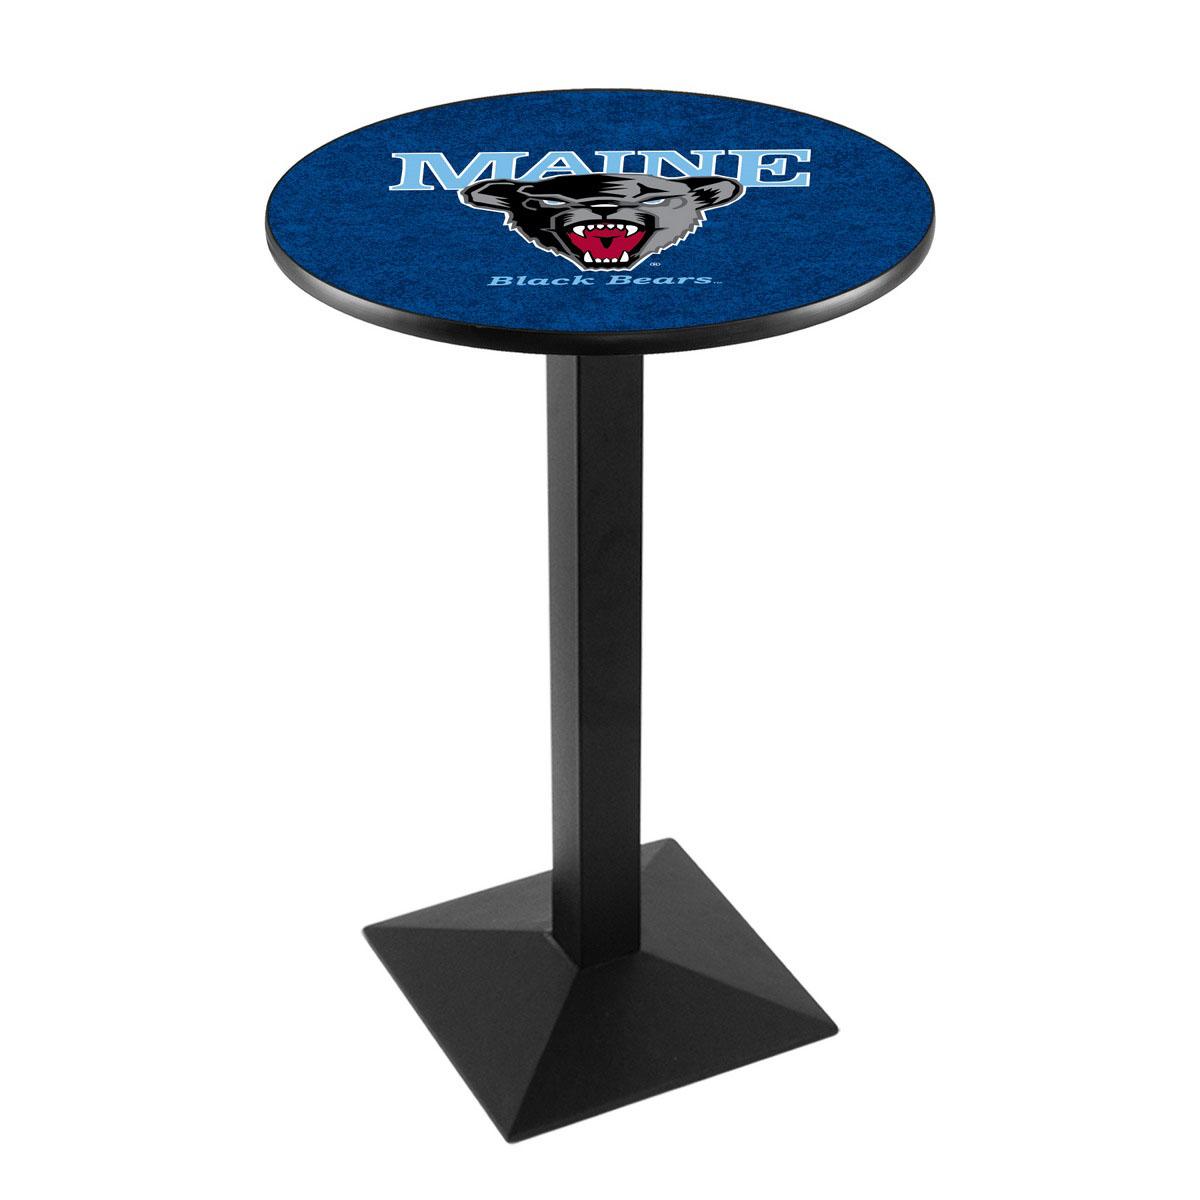 Buy University Maine Logo Pub Bar Table Square Stand Product Photo